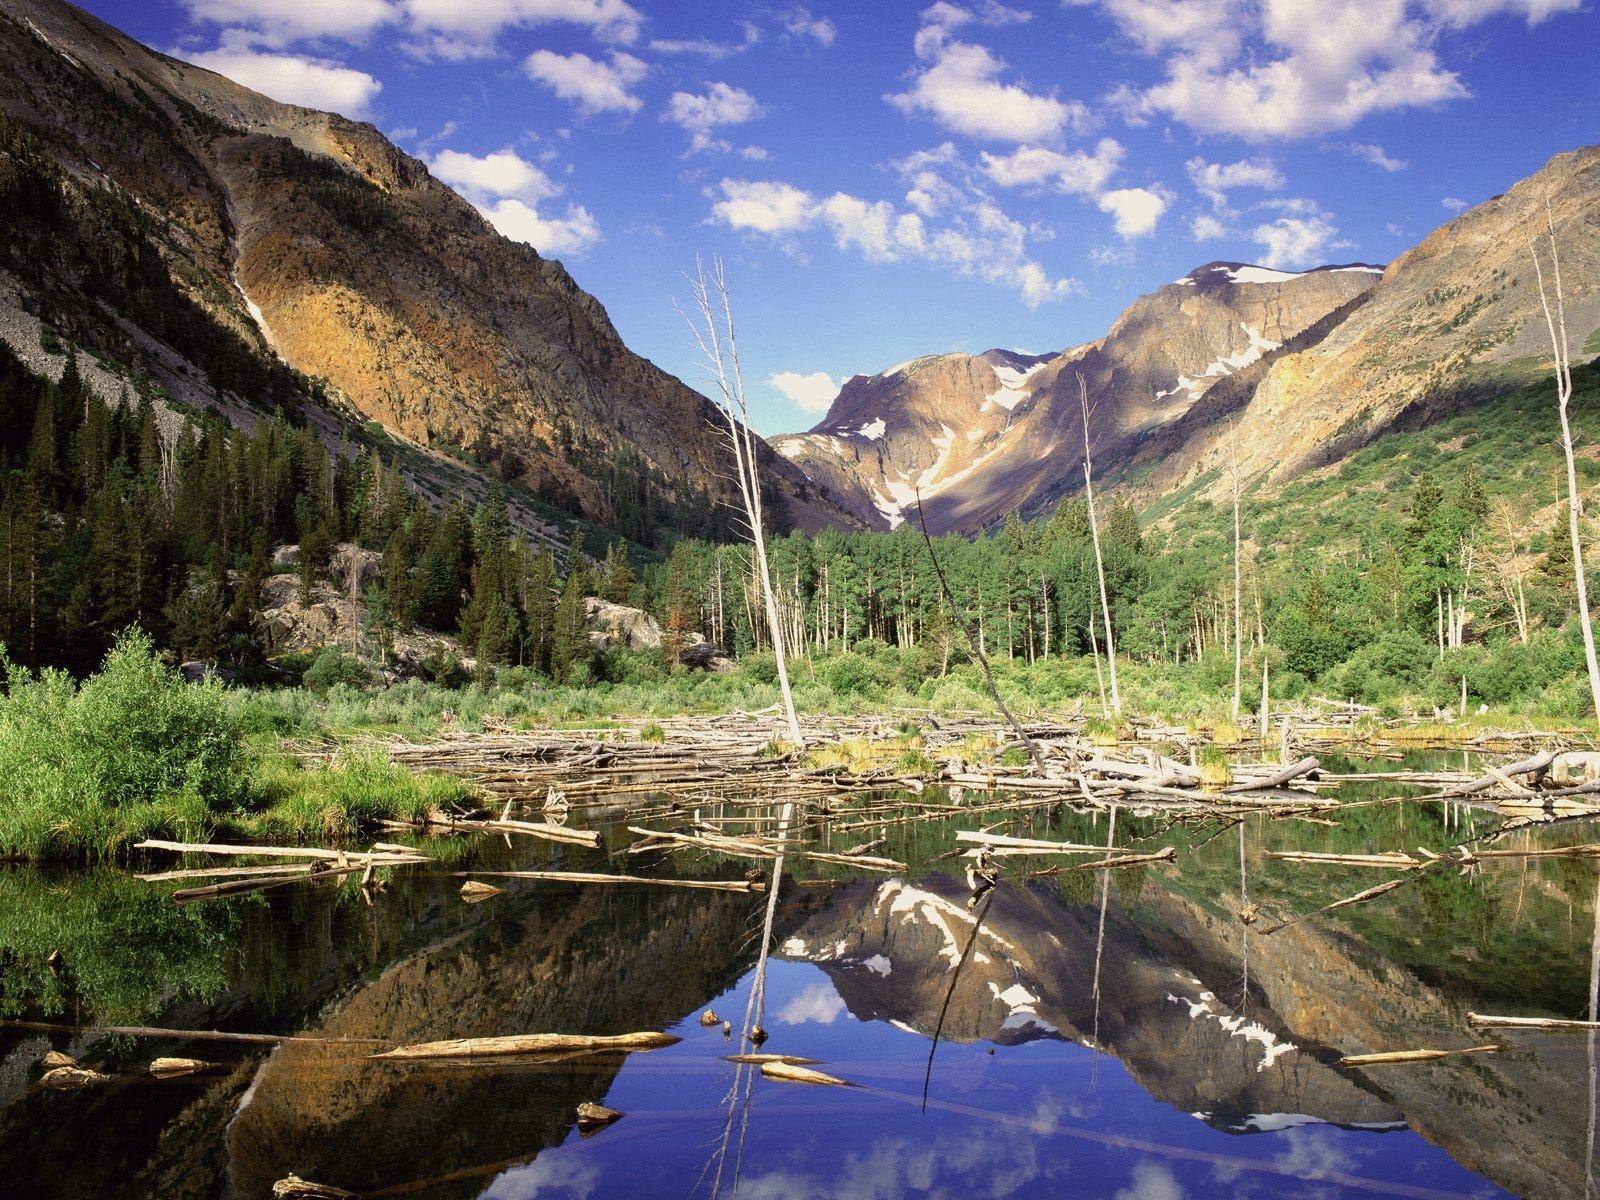 Desktop Wallpapers Sierra Nevada Range Californi Nature